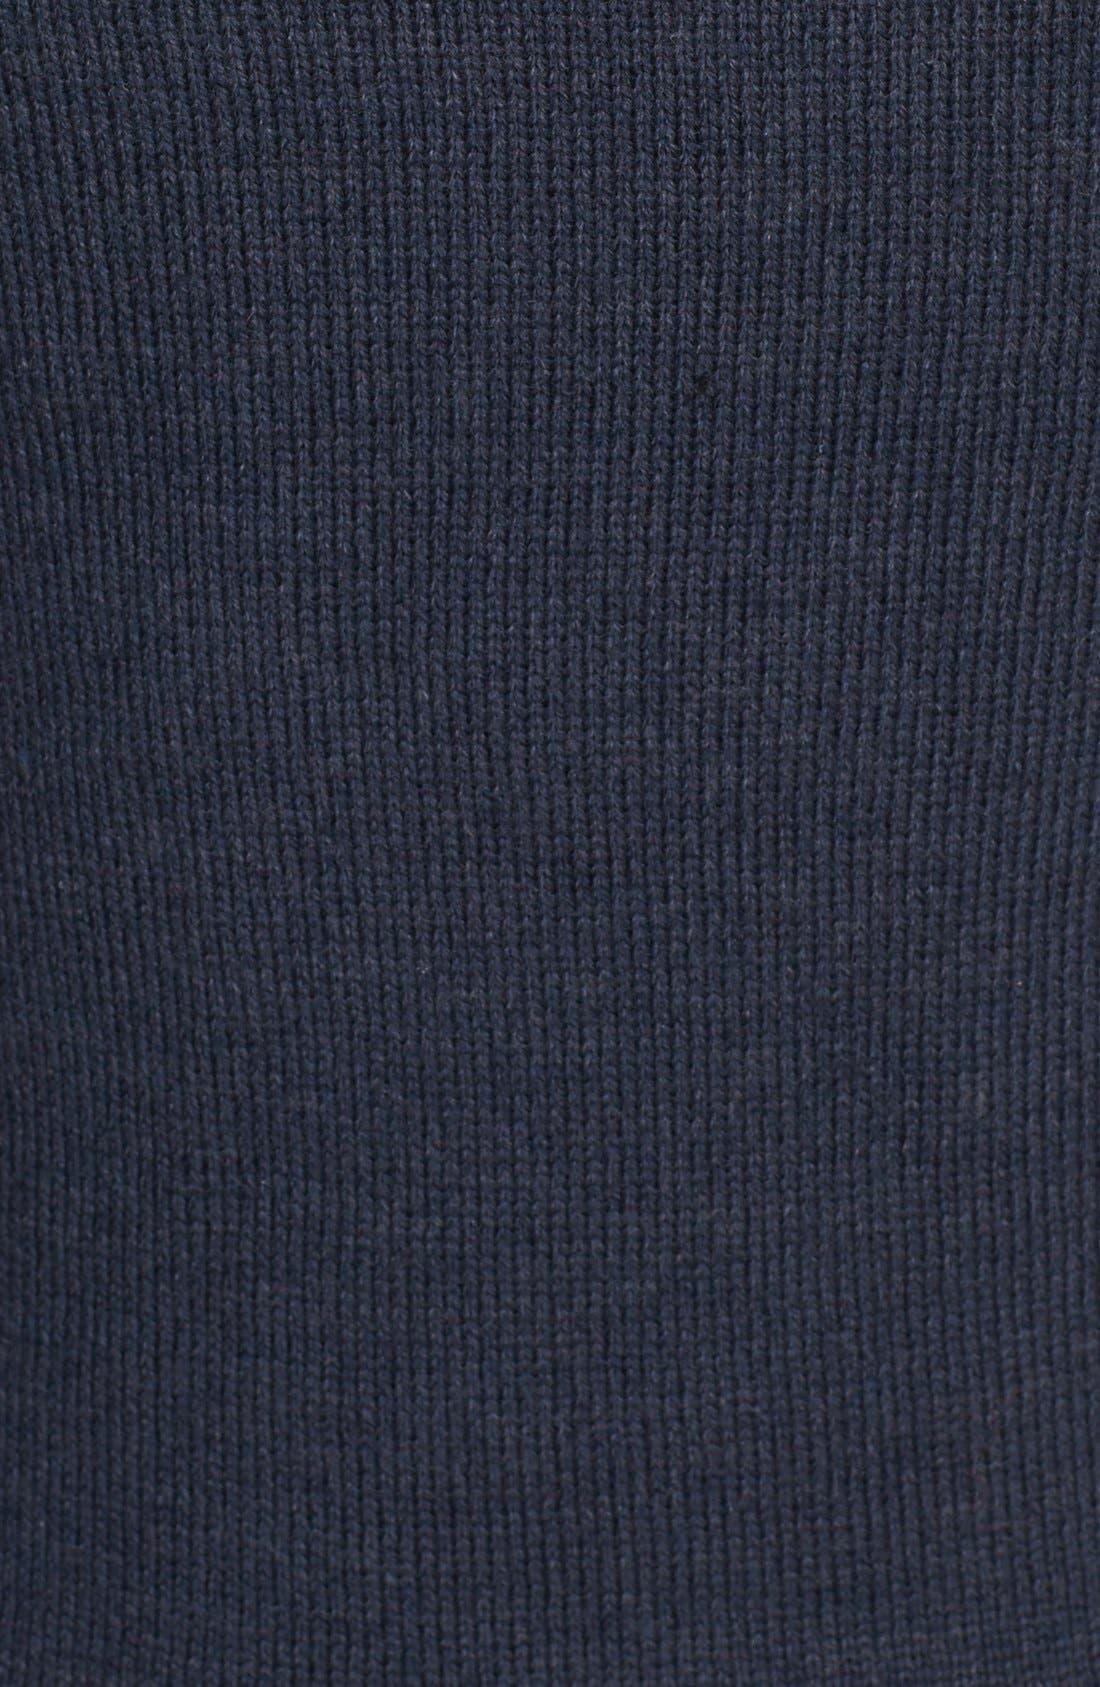 Alternate Image 3  - Bench. 'Glaster' Sweater Dress